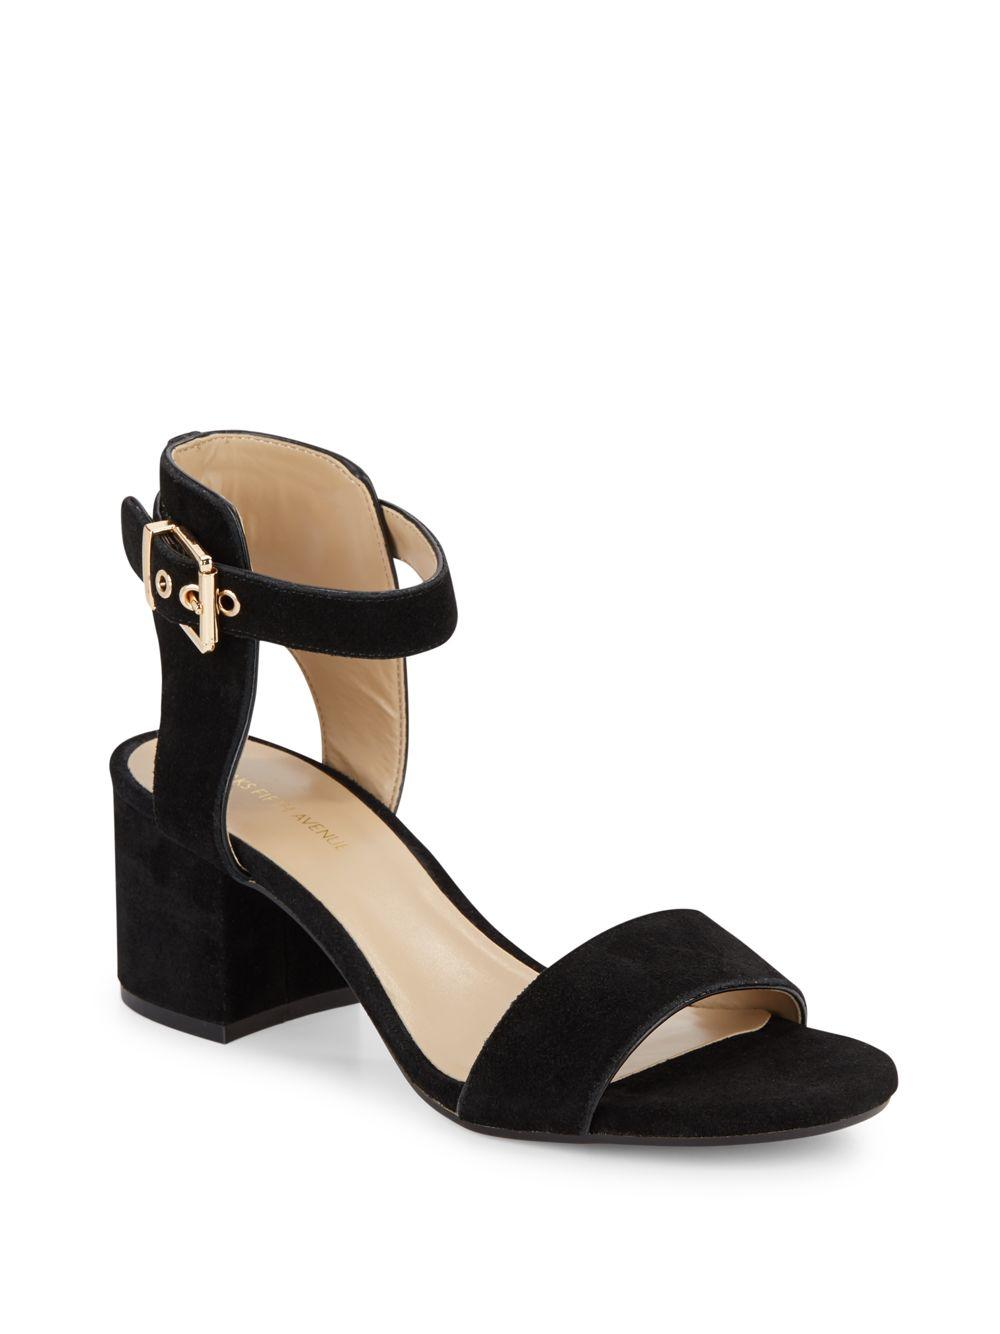 saks fifth avenue helaine suede sandals in black lyst